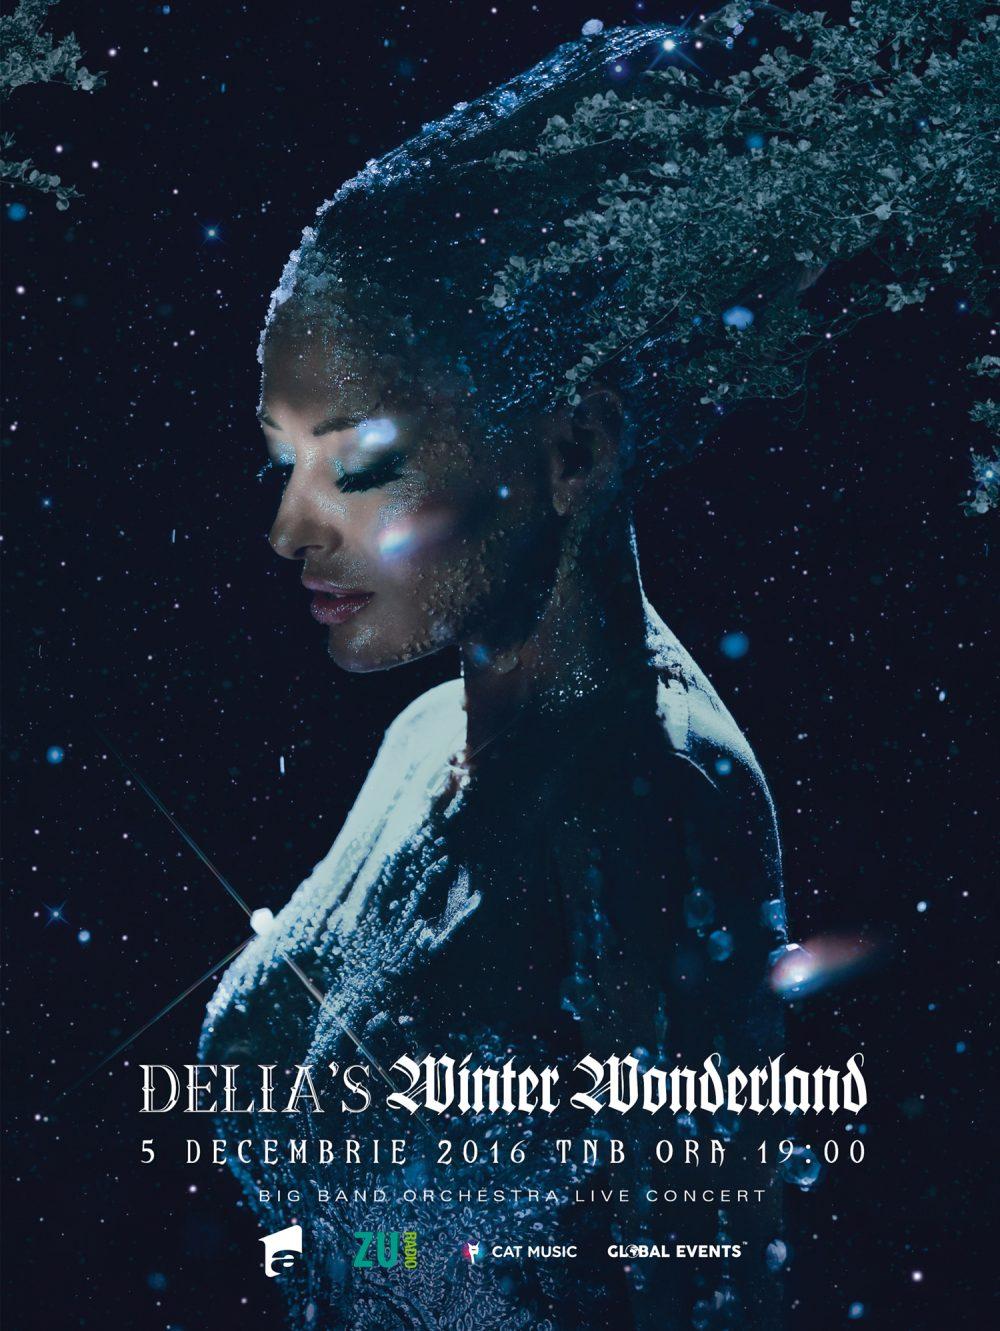 delia-s-winter-wonderland-poster